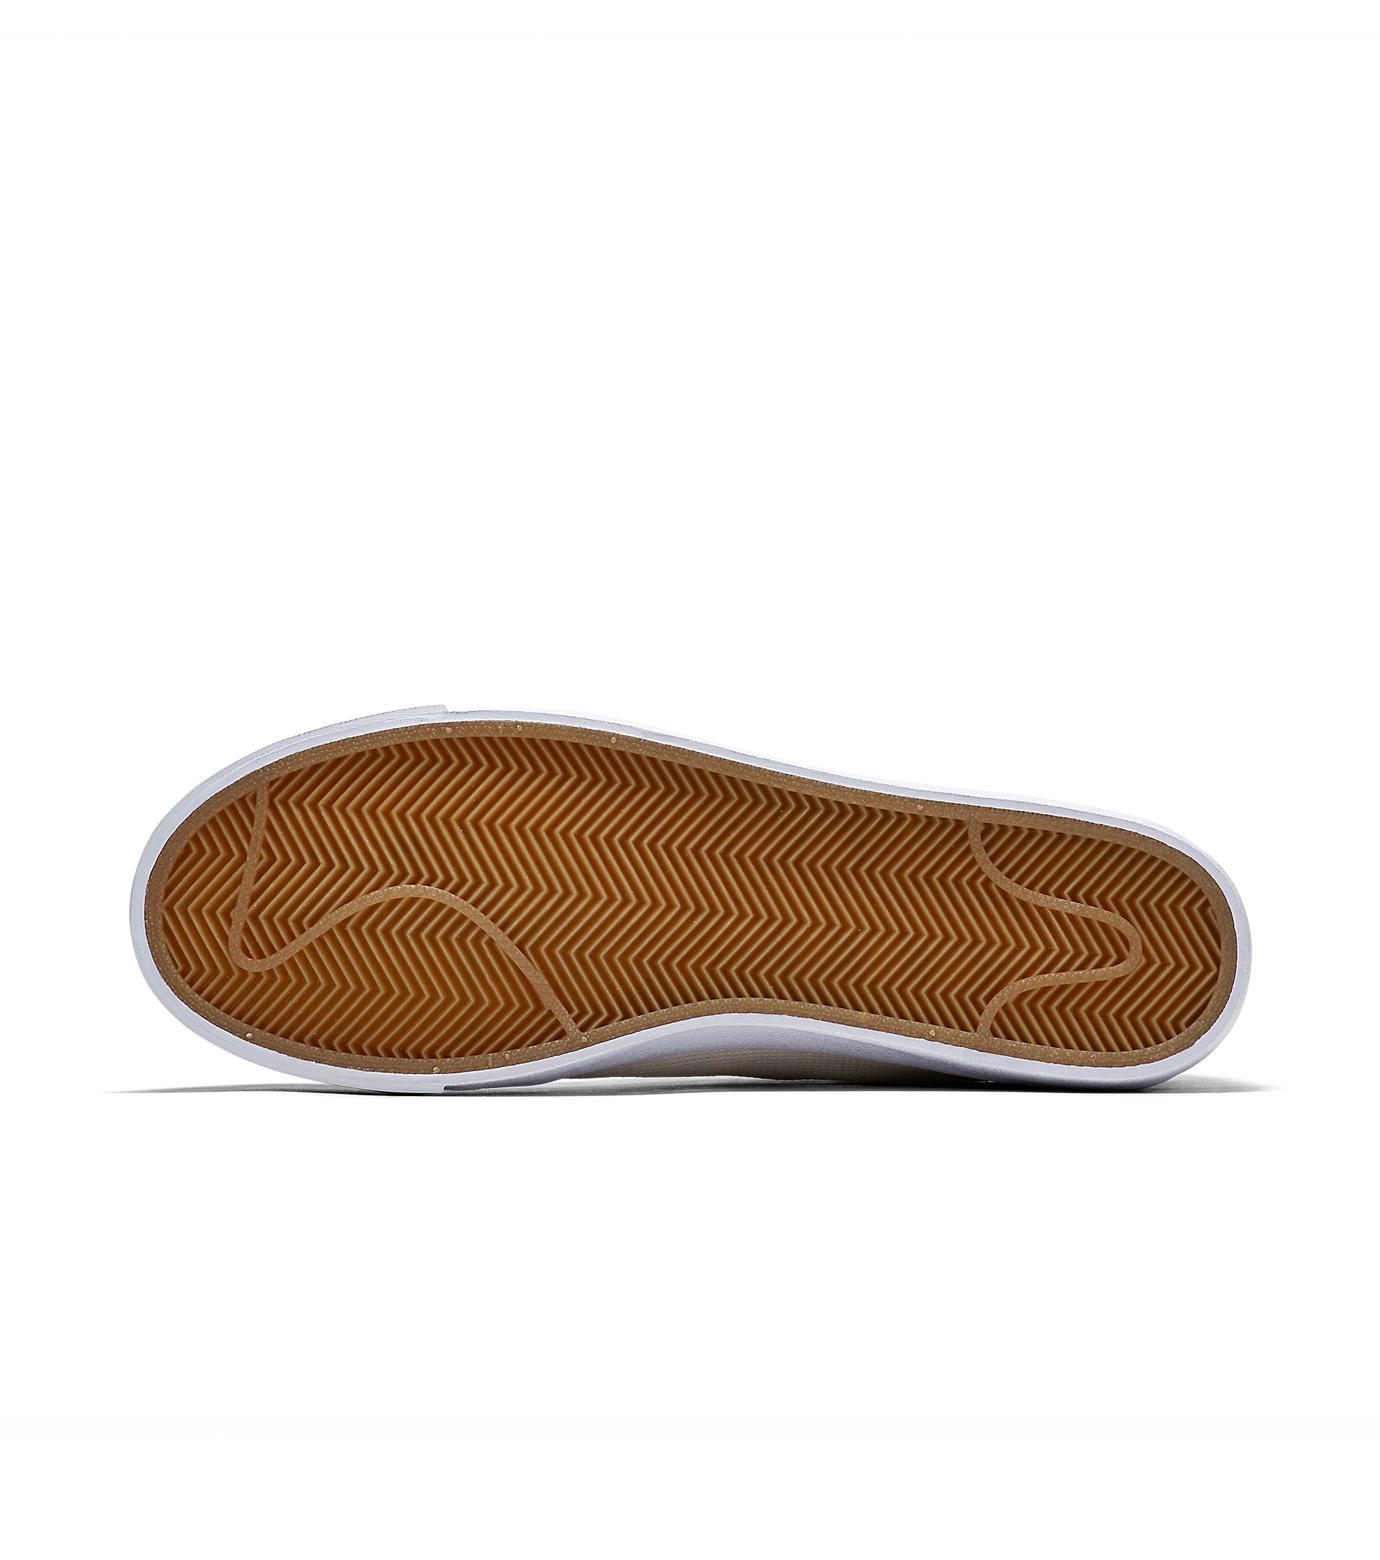 NIKE(ナイキ)のMatch Classic Suede-BEIGE(シューズ/shoes)-864718-100-52 拡大詳細画像2